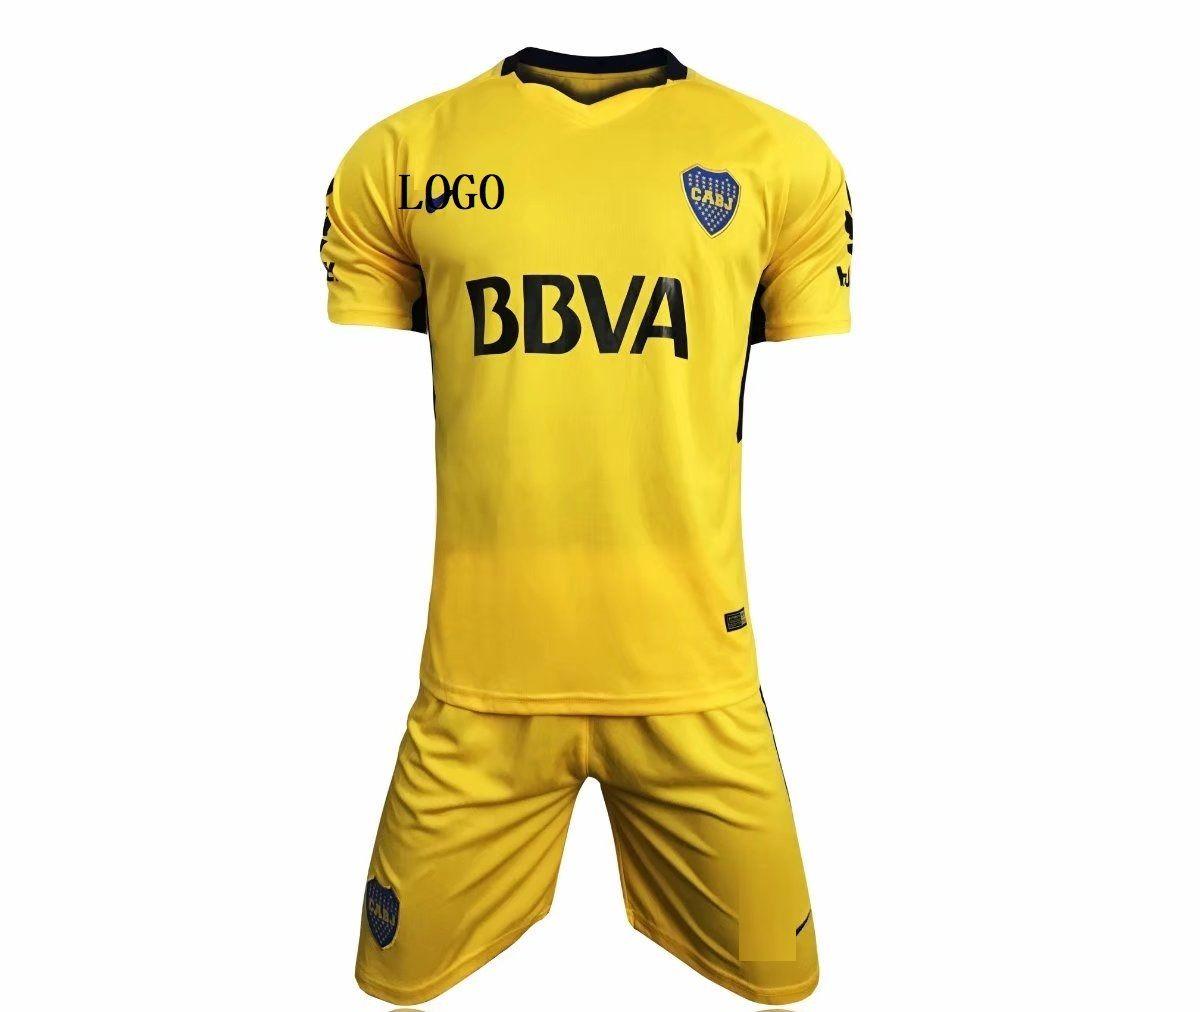 a0fc89dac Boca Juniors 2017-2018 away Yellow Soccer Jersey Uniforms Adult Football  Kits